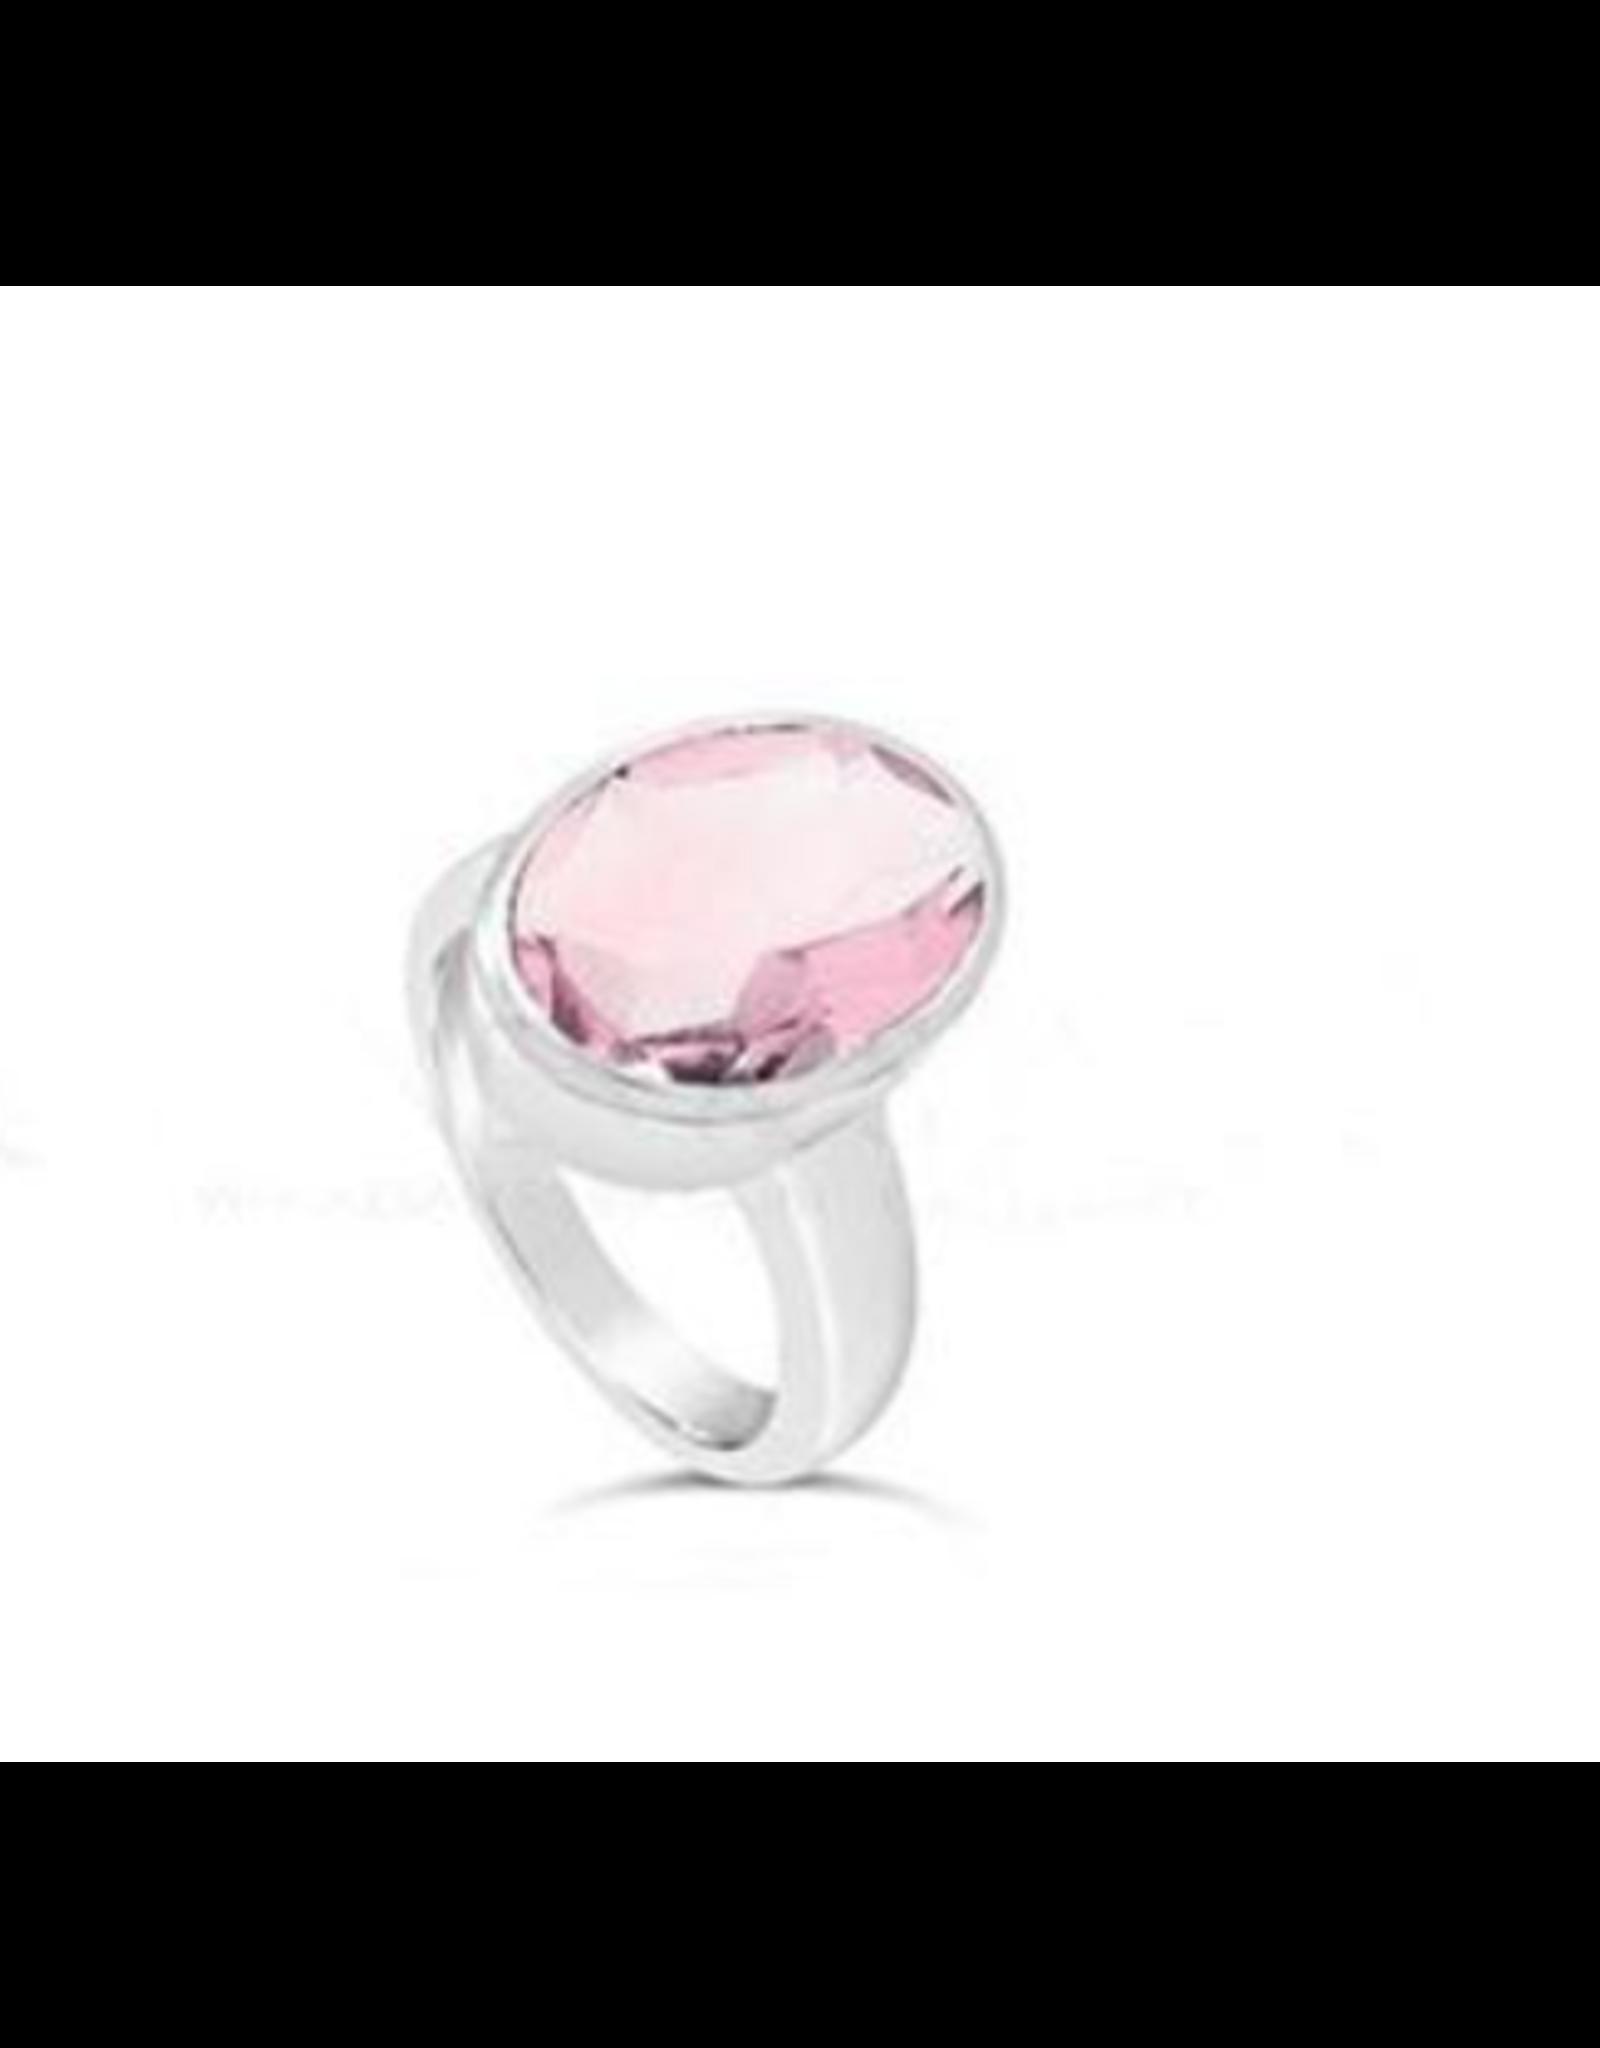 Stones & Silver Rose Quartz Ring 10mmx14mm